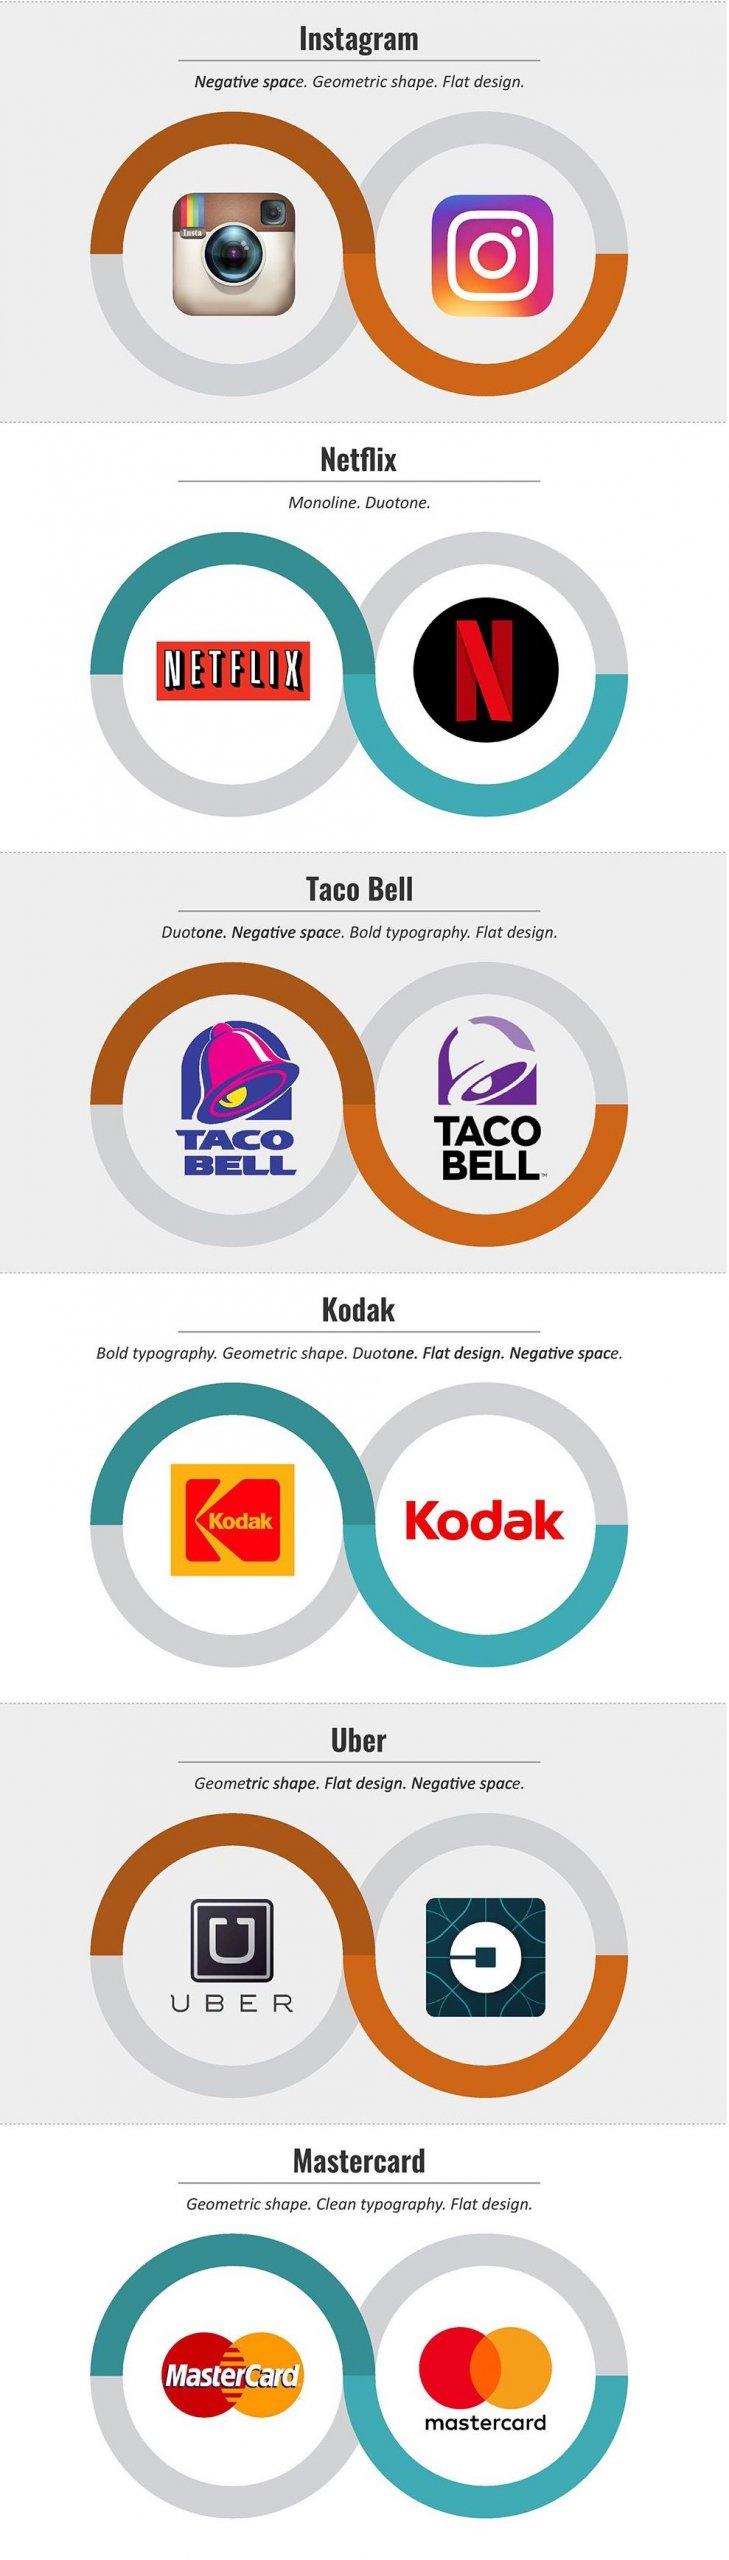 Эволюция логотипов крупных компаний